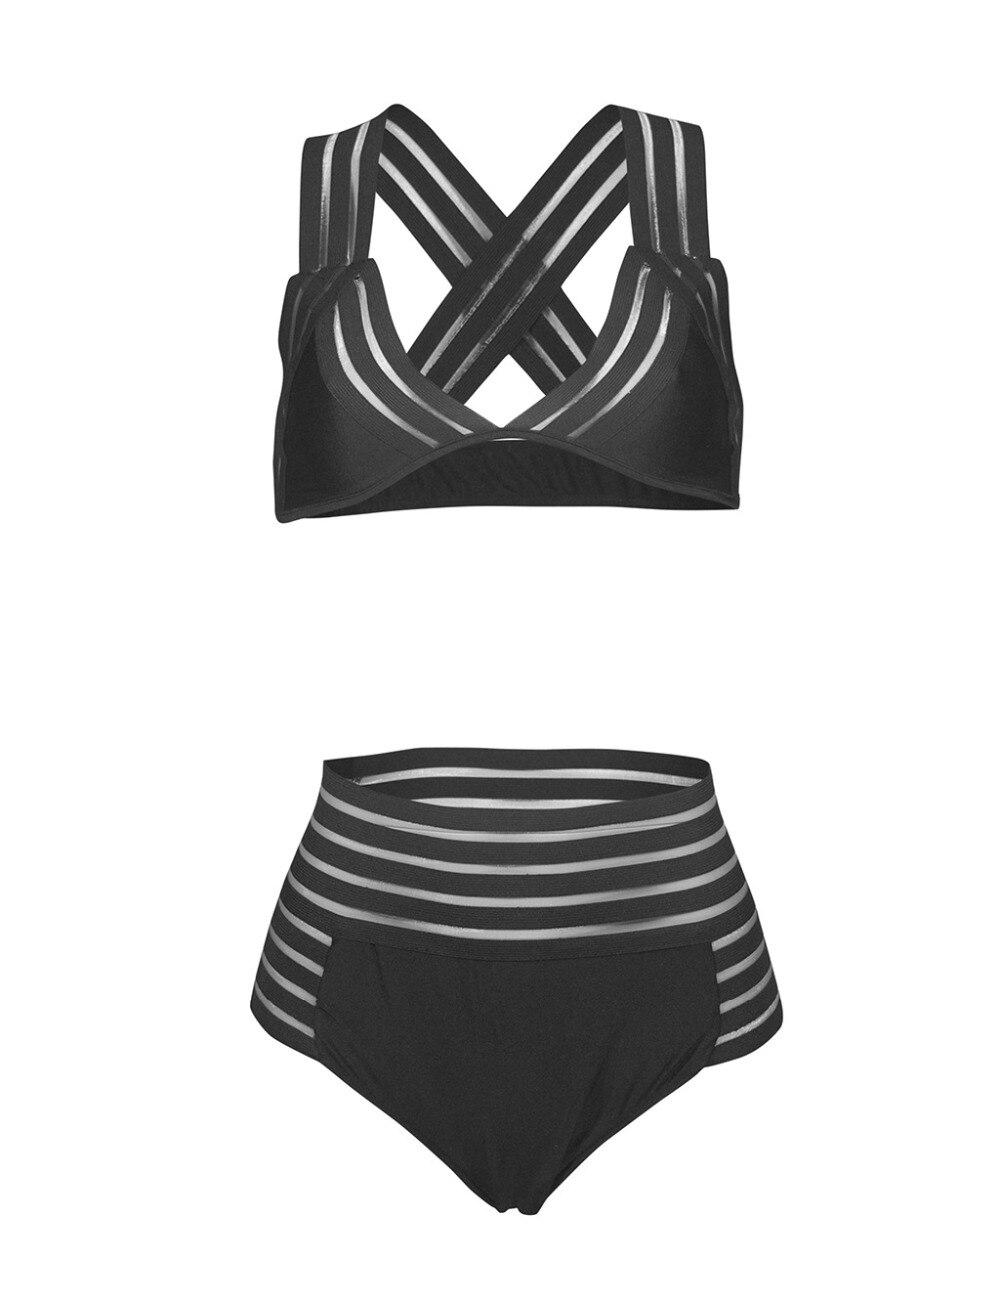 2018 alta cintura Stripped Hollow Out Net Bikini Set traje de baño